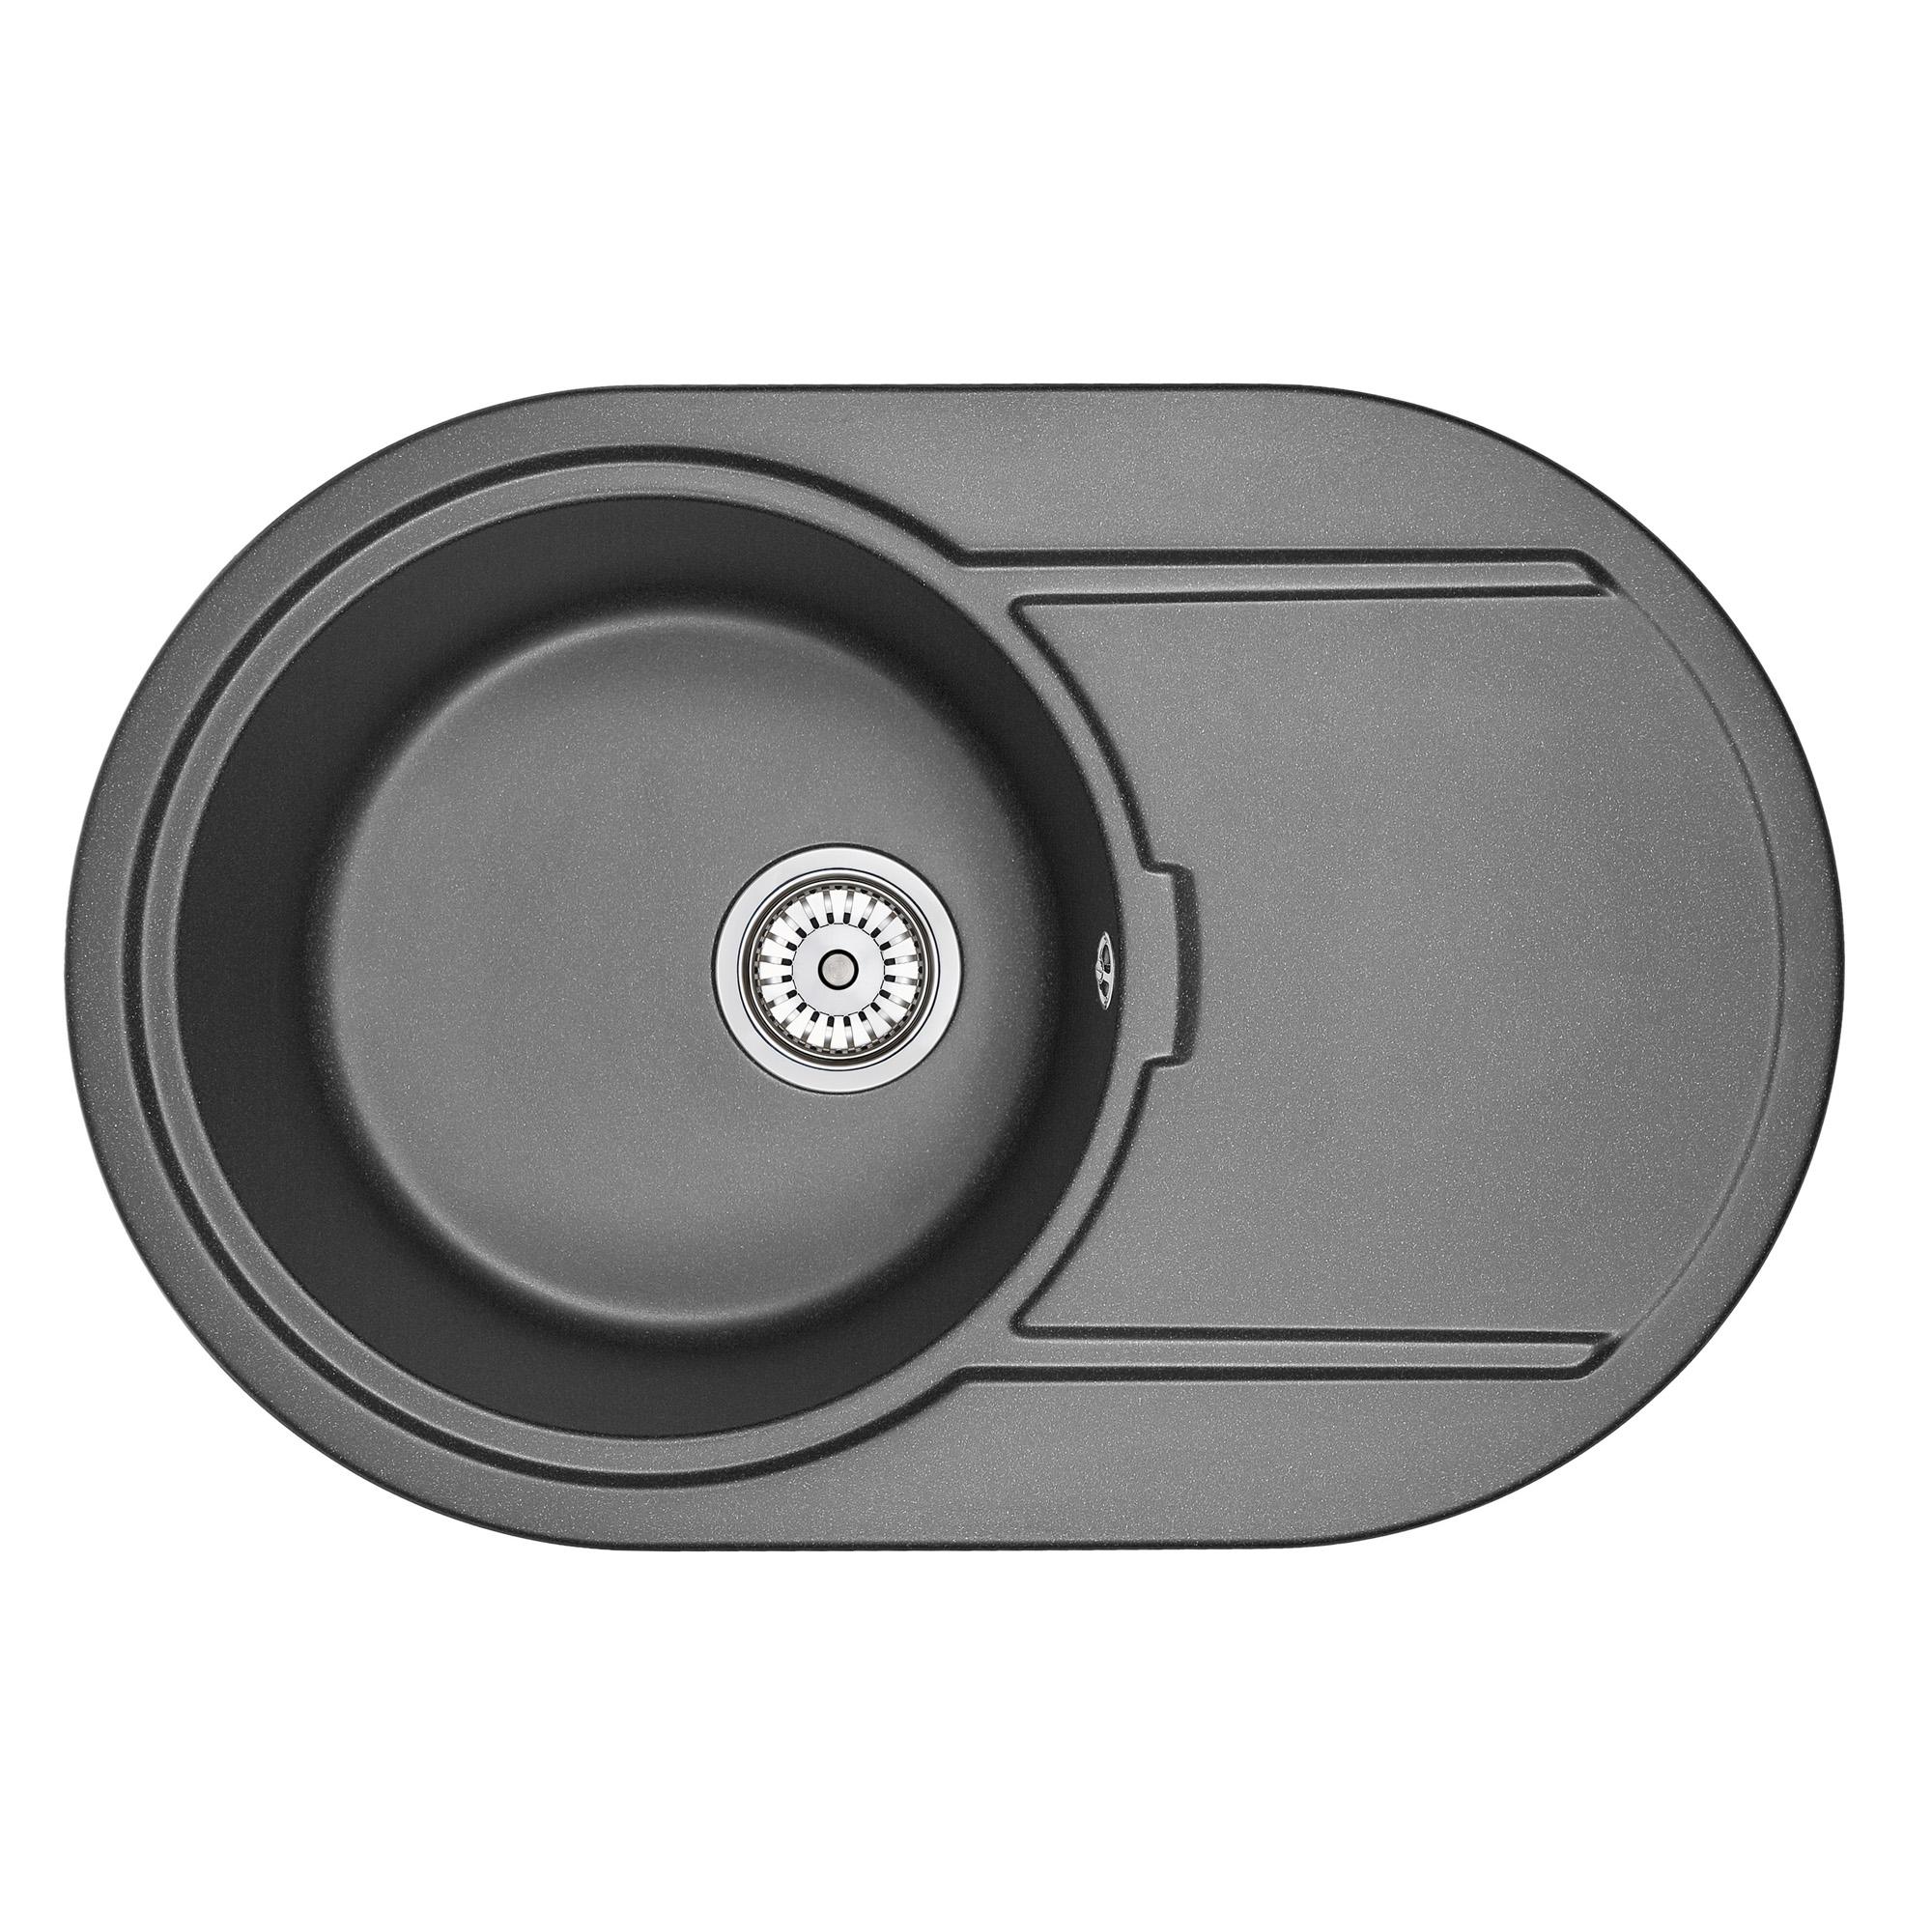 Кухонная мойка Granula GR-7603 760х500 черный мойка кухонная dr gans берта 760 черный 25 040 c0760 407